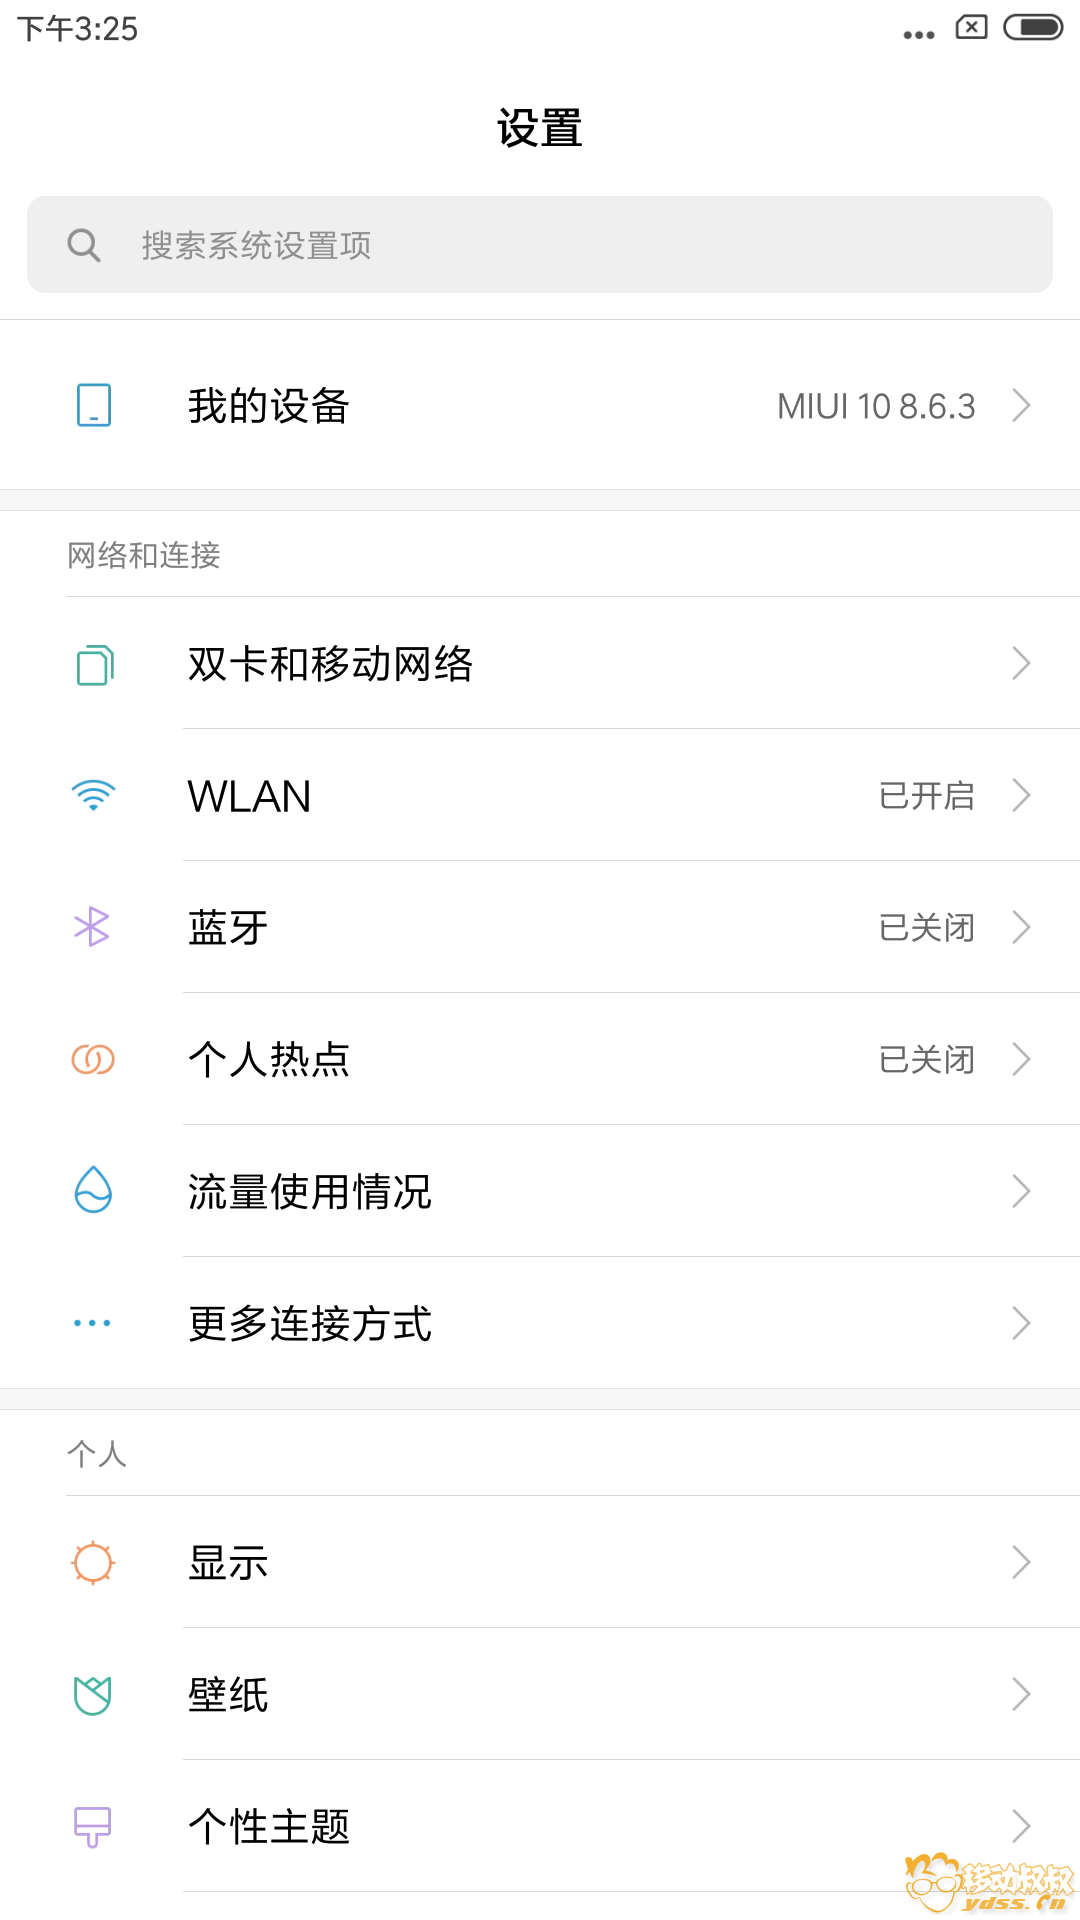 Screenshot_2018-06-03-15-25-59-812_com.android.settings.png